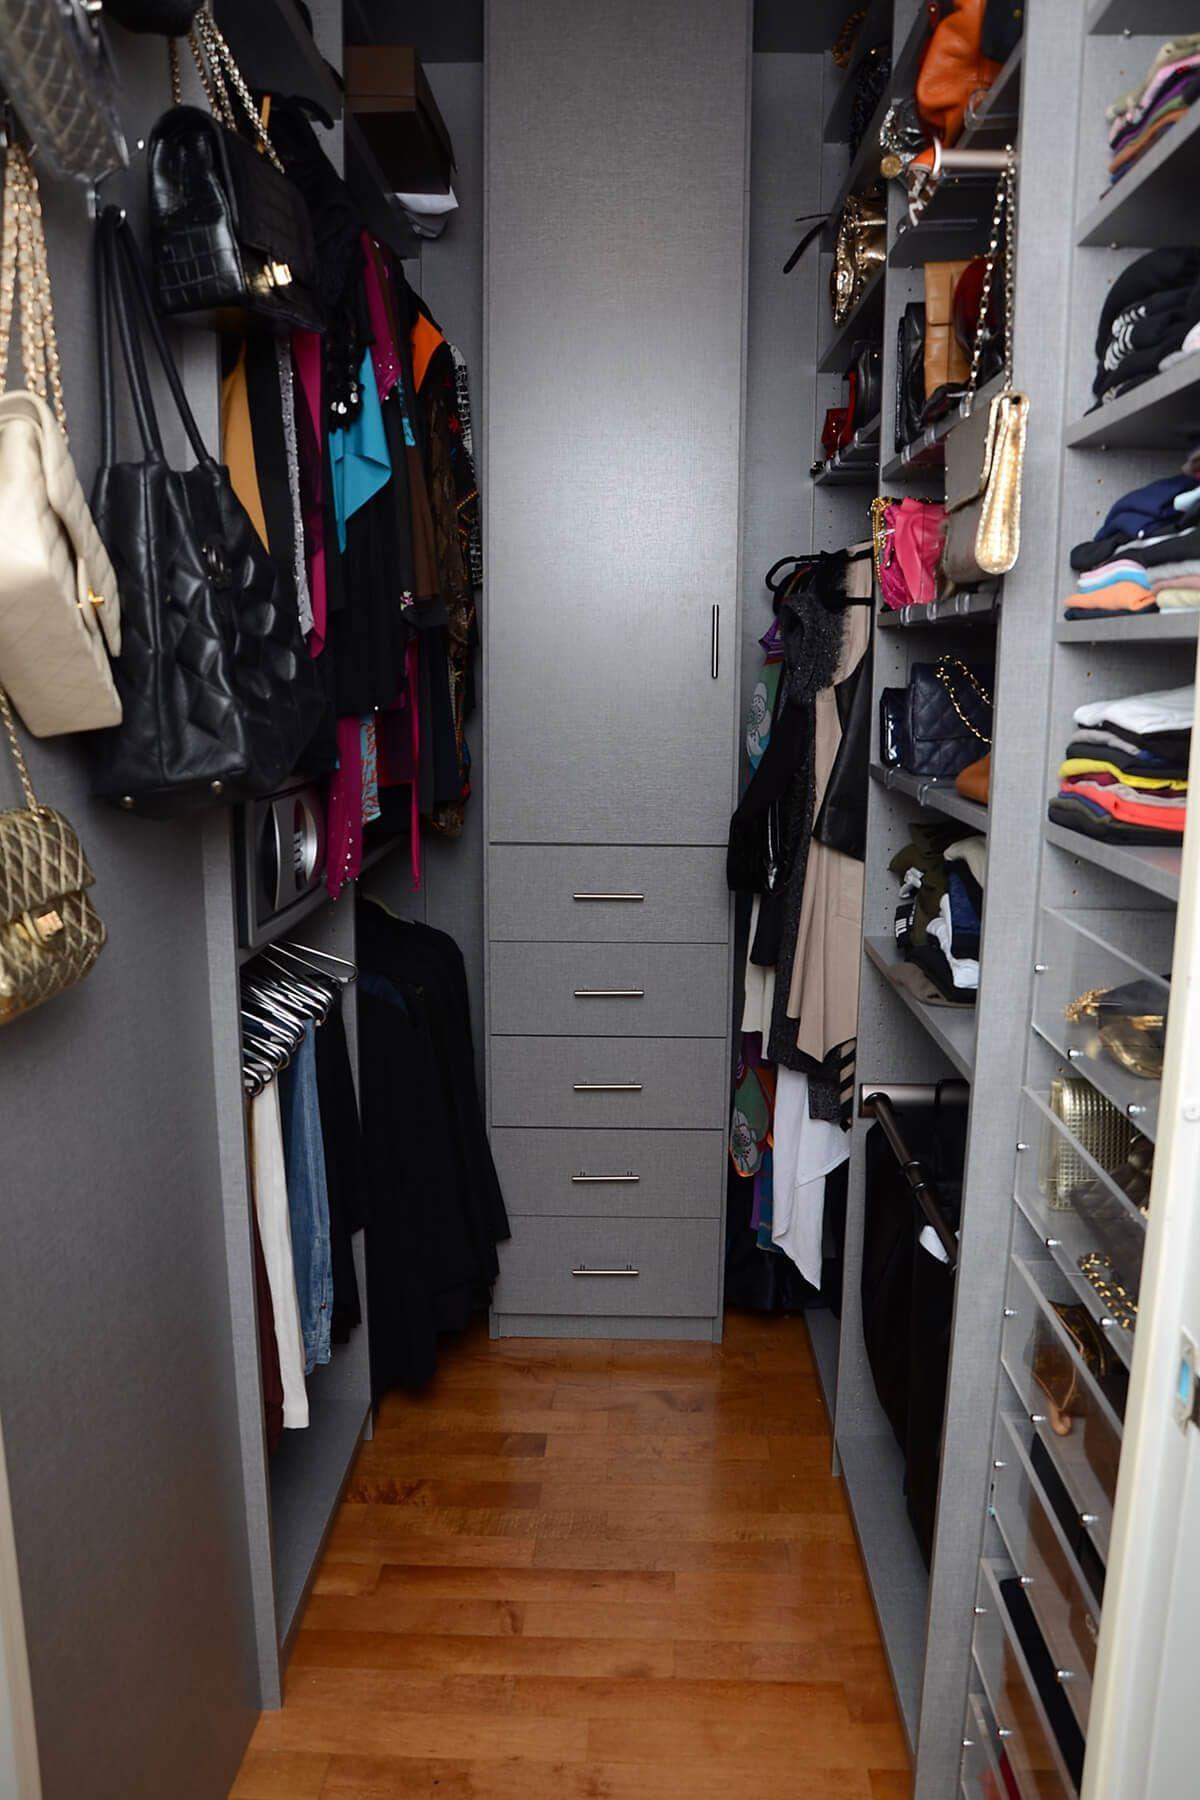 Gray Melamine System Transforms This Narrow Walk In Closet